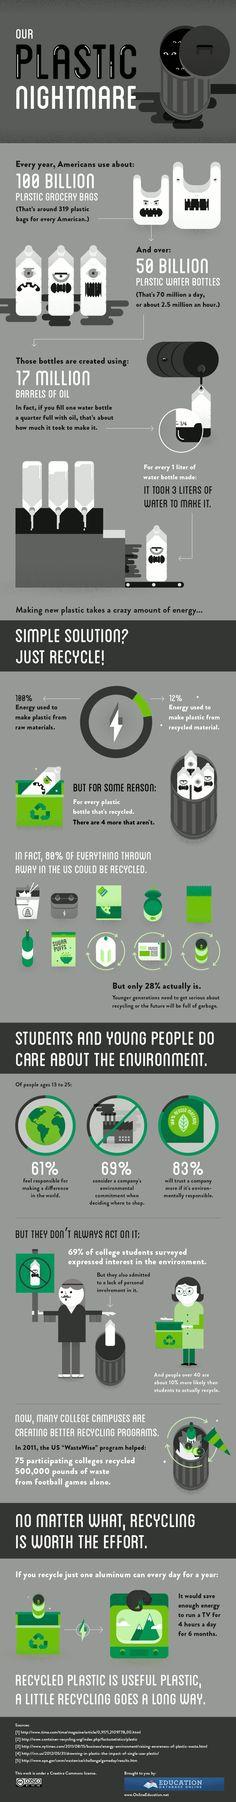 Our Plastic Nightmare